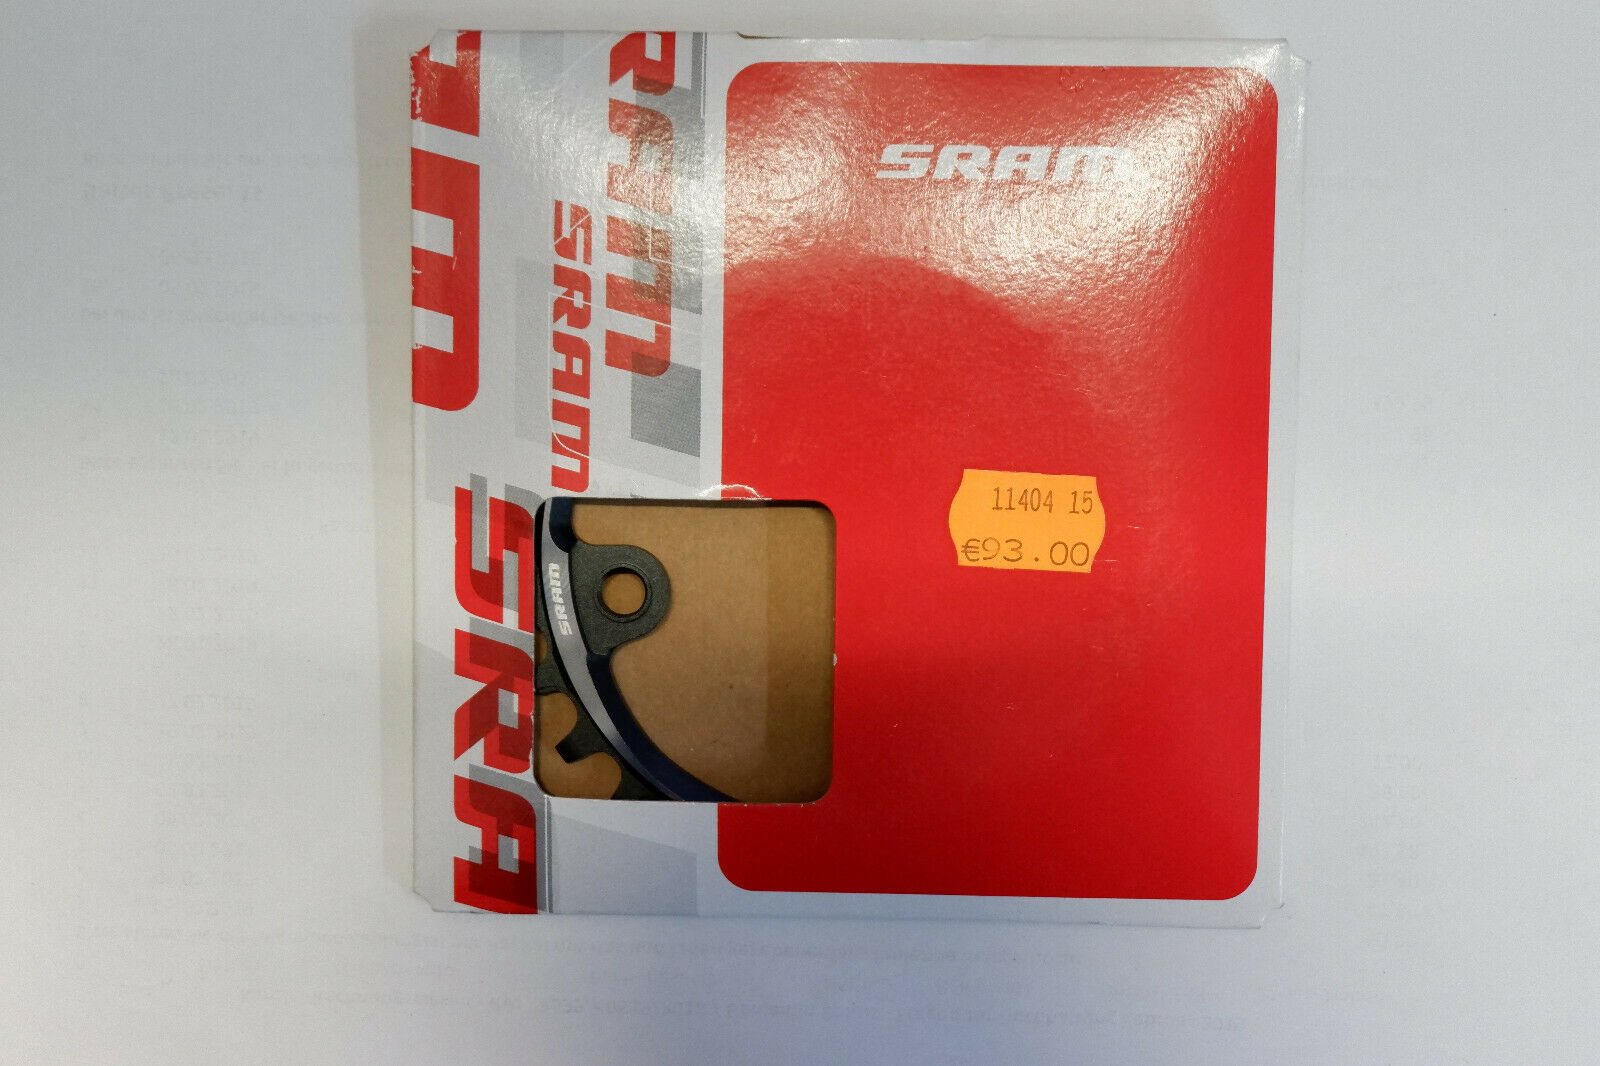 SRAM X-Sync Chainring 28z 28T 76LK BCD 11 Speed NEW